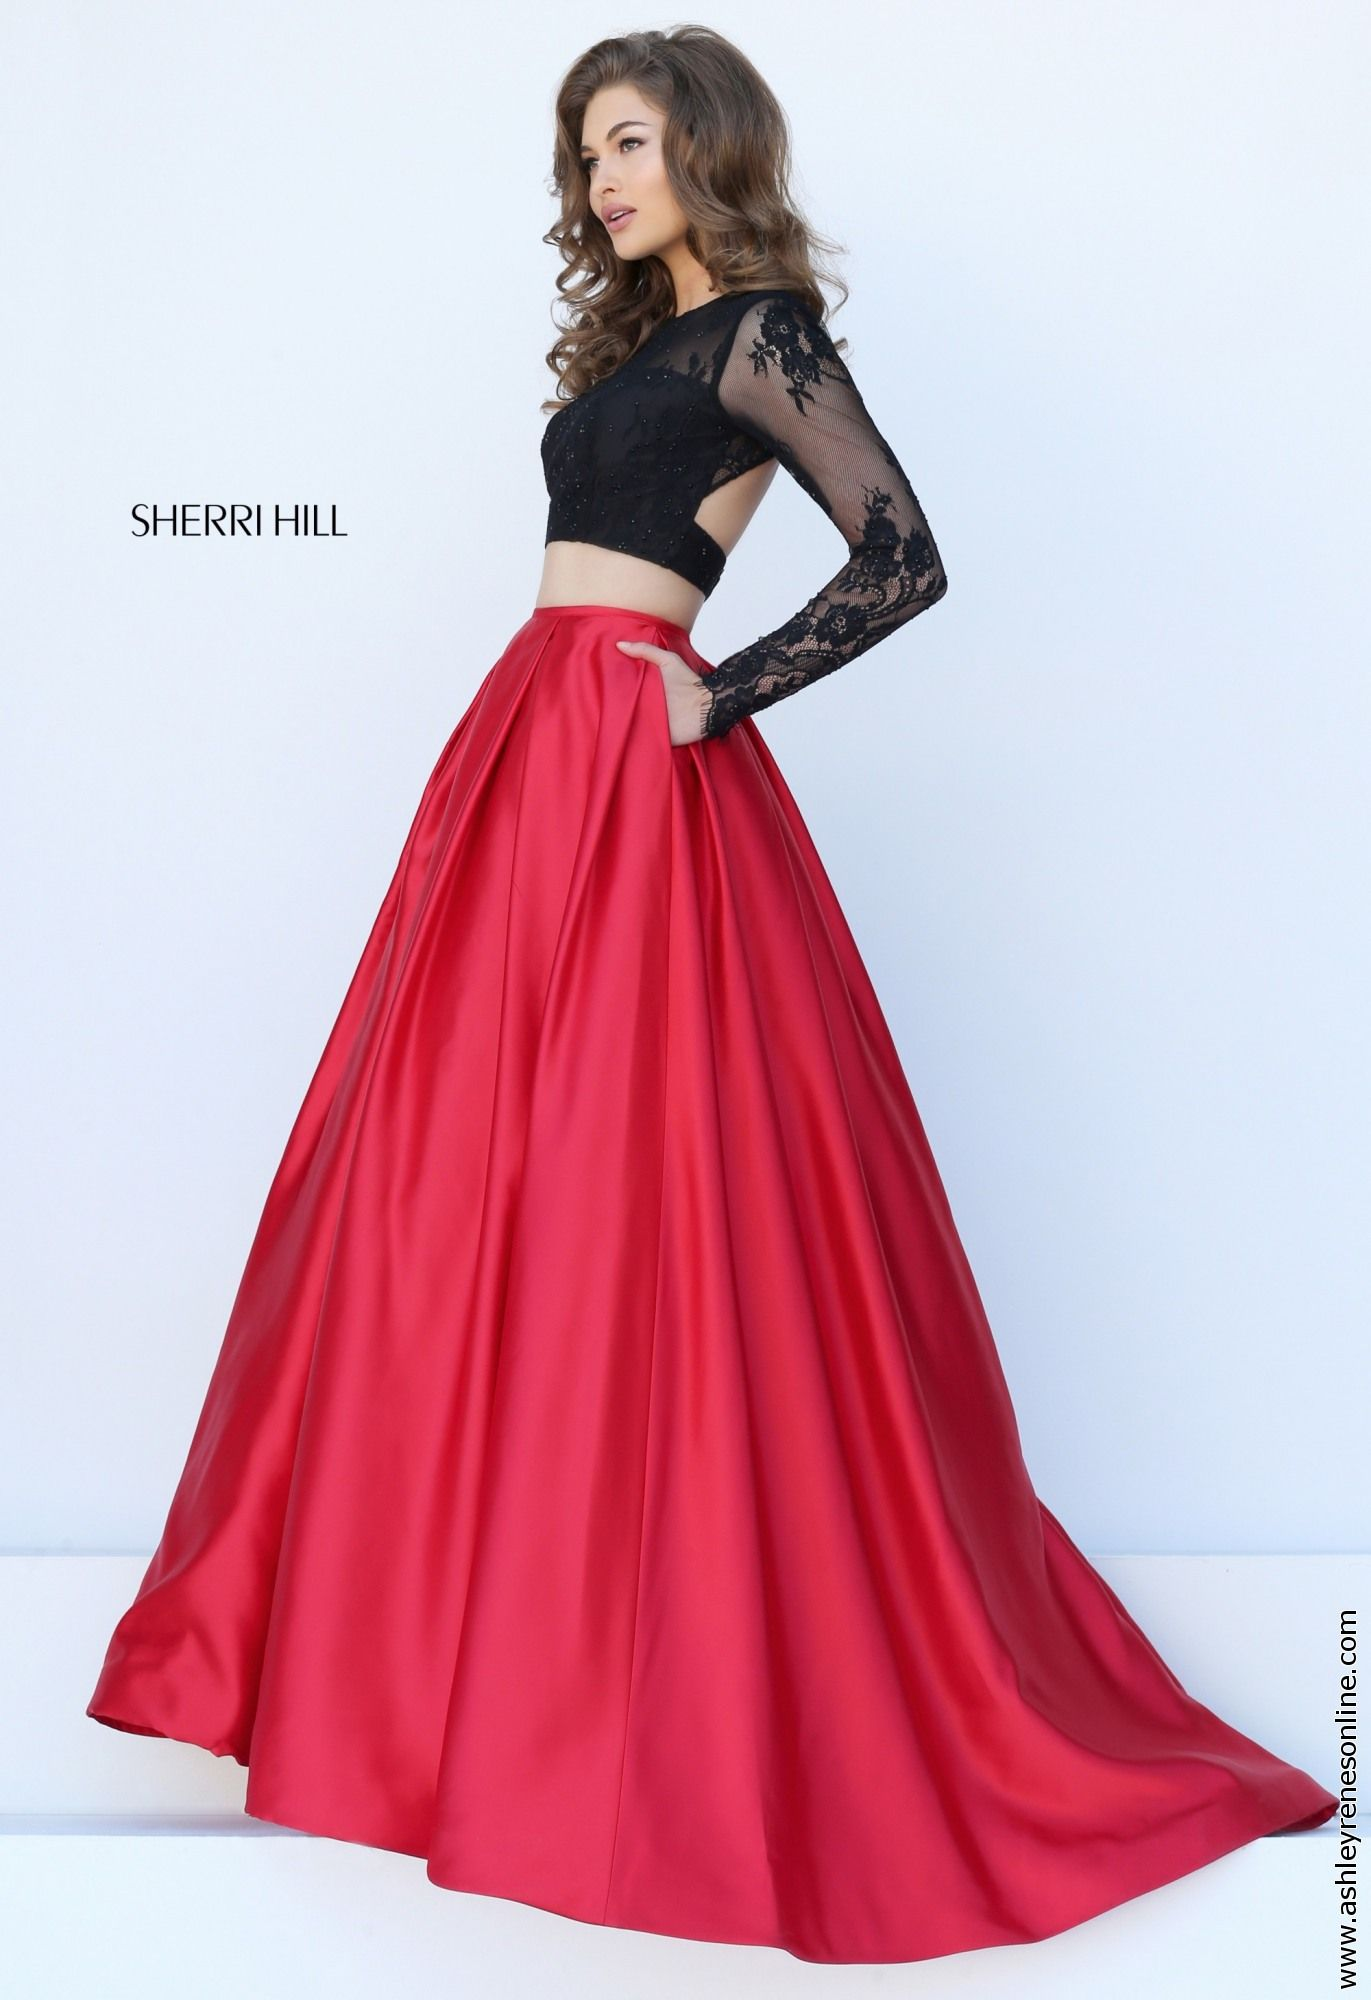 Sherri Hill red prom dress at Ashley Rene\'s Elkhart, IN 574-522-7766 ...